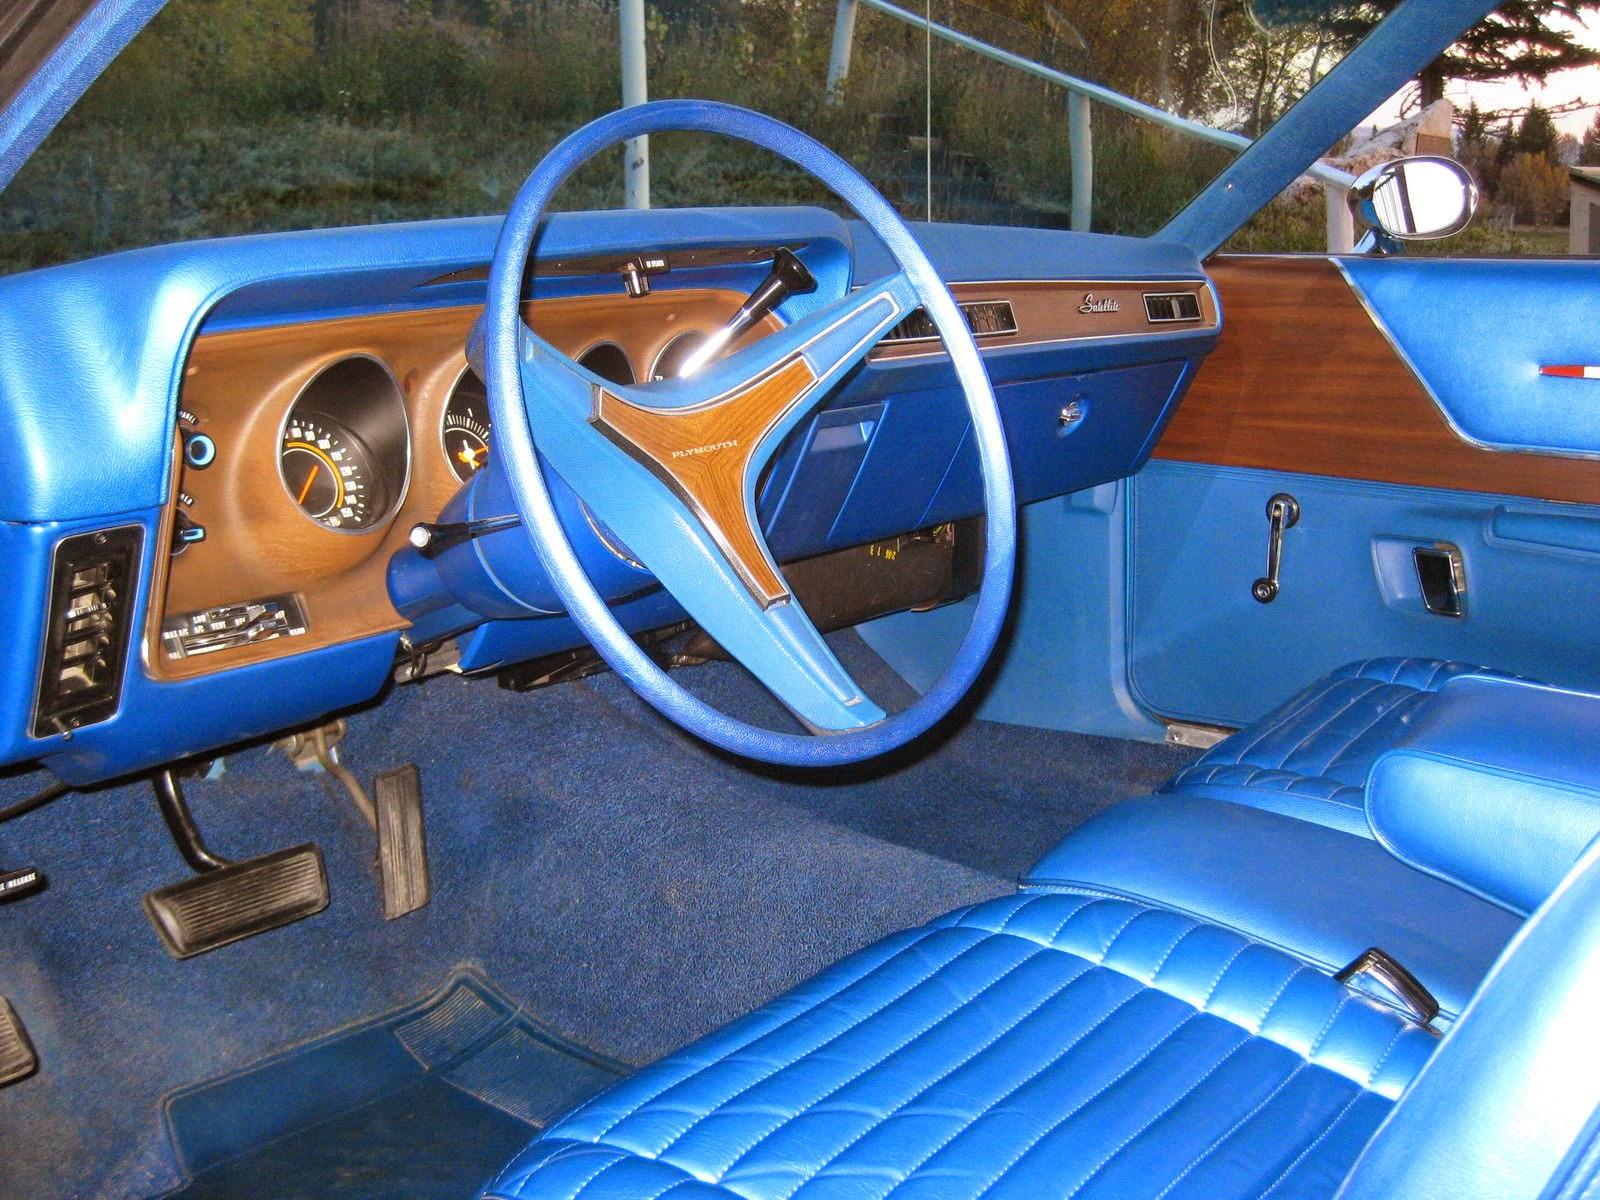 Dodge Suv 2016 >> All American Classic Cars: 1972 Plymouth Satellite Sebring Plus 2-Door Hardtop